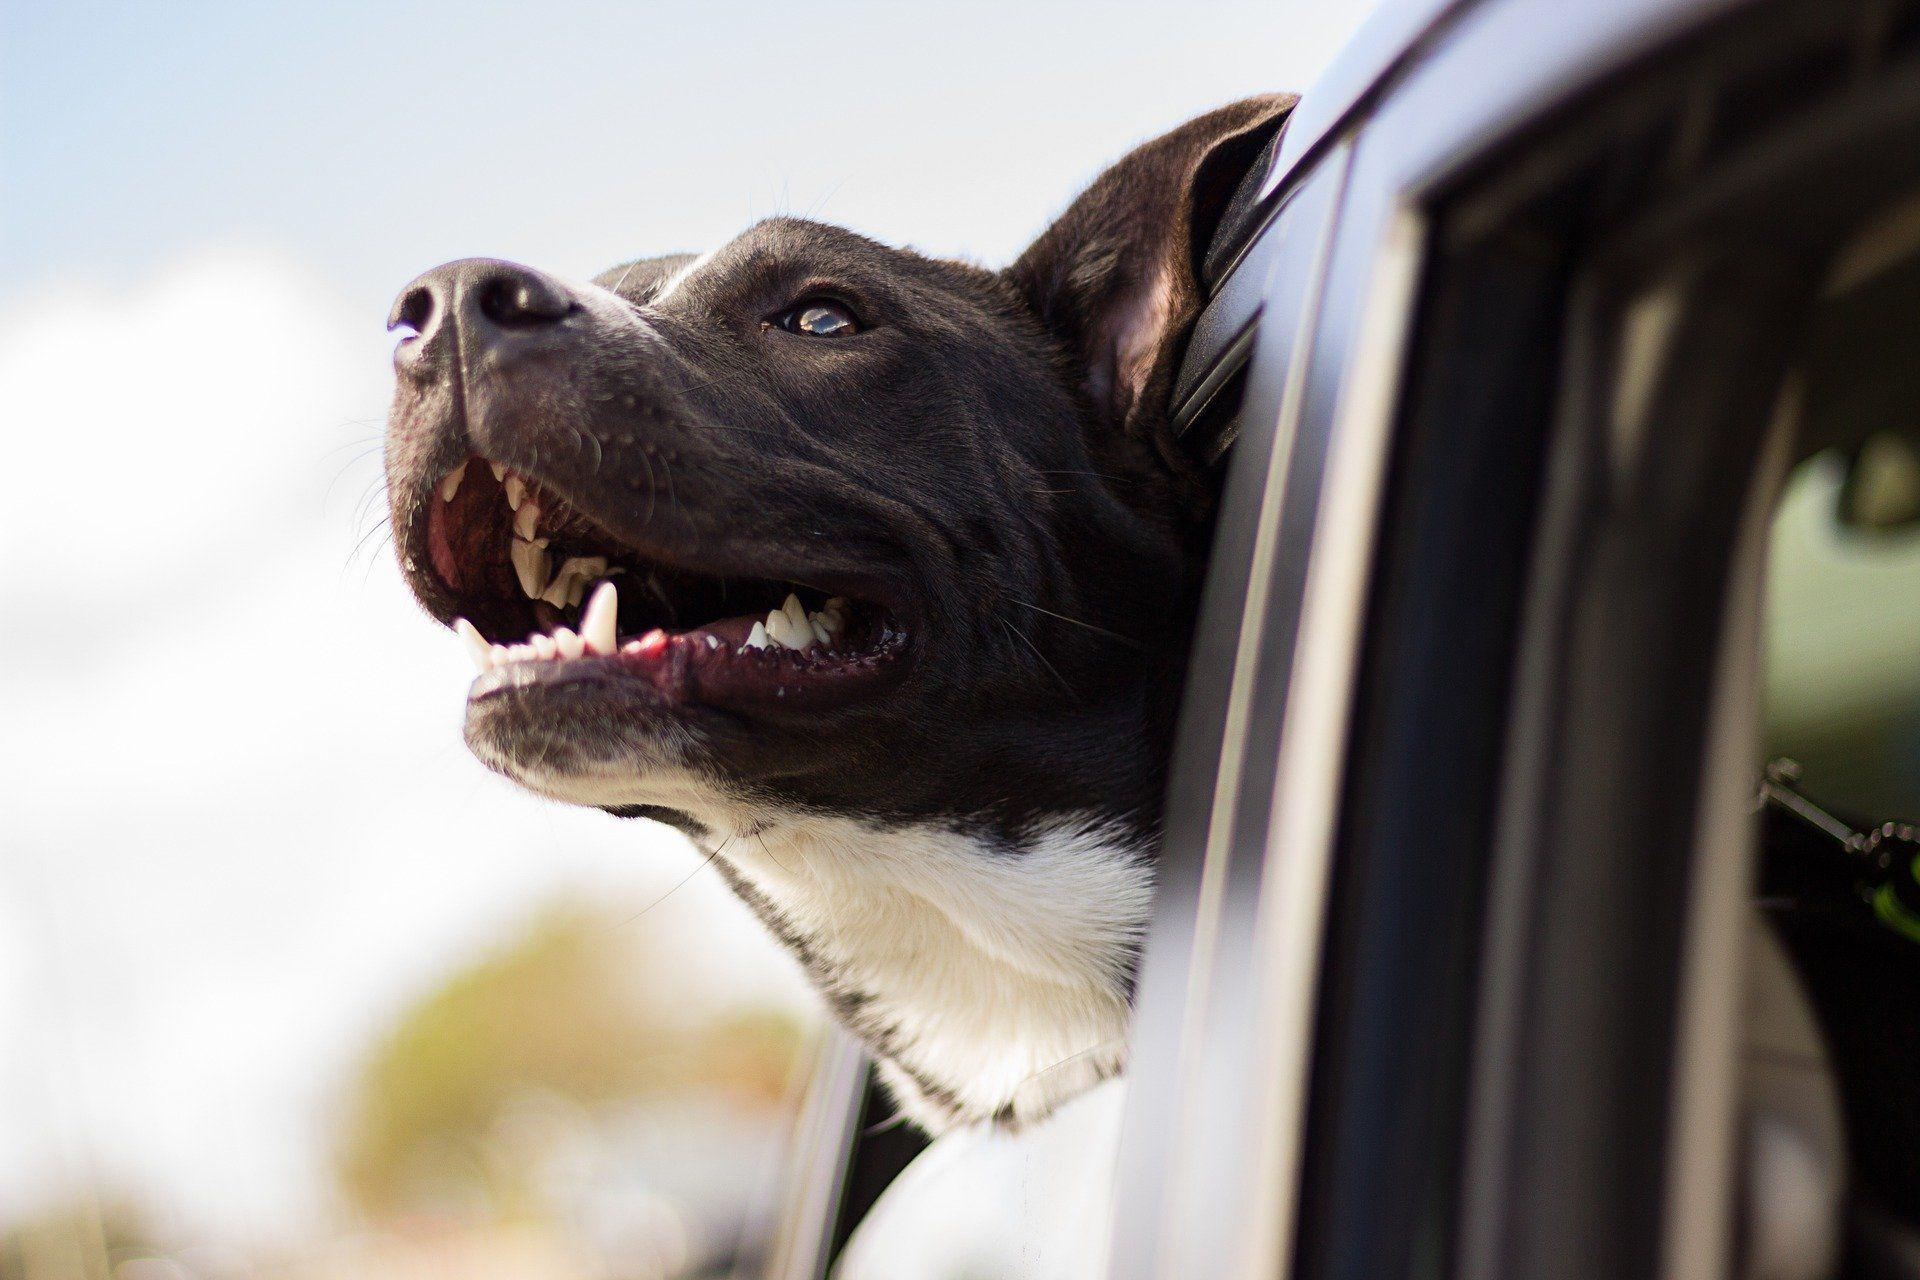 Dog in the car window